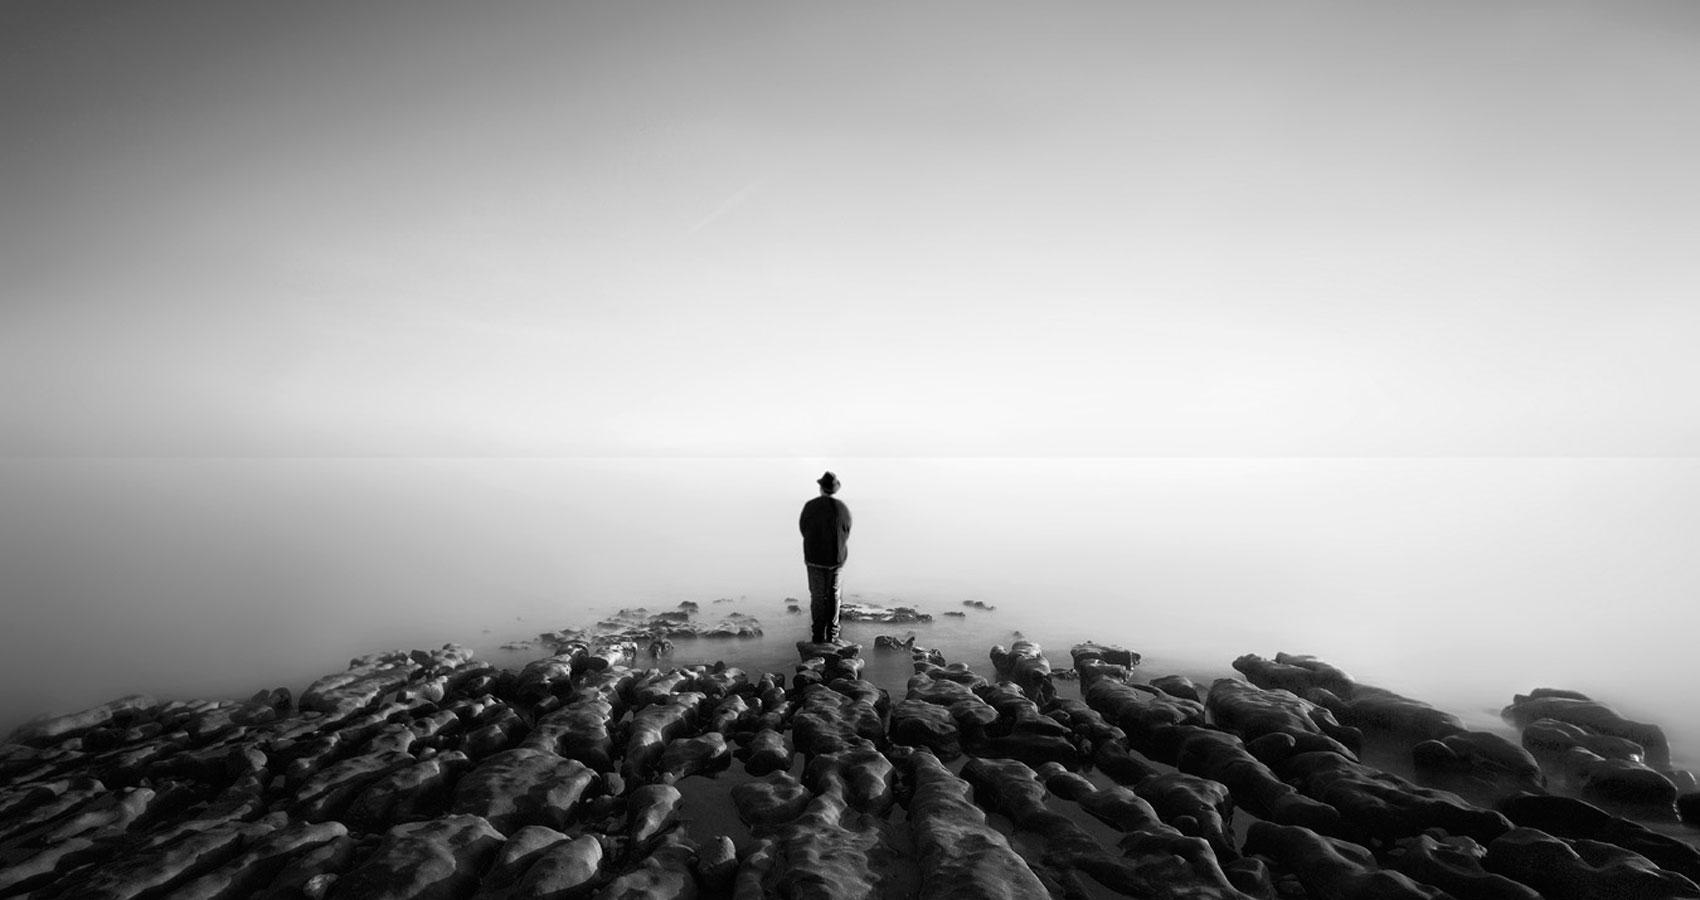 Solitude by Ella Wheeler Wilcox at Spillwords.com